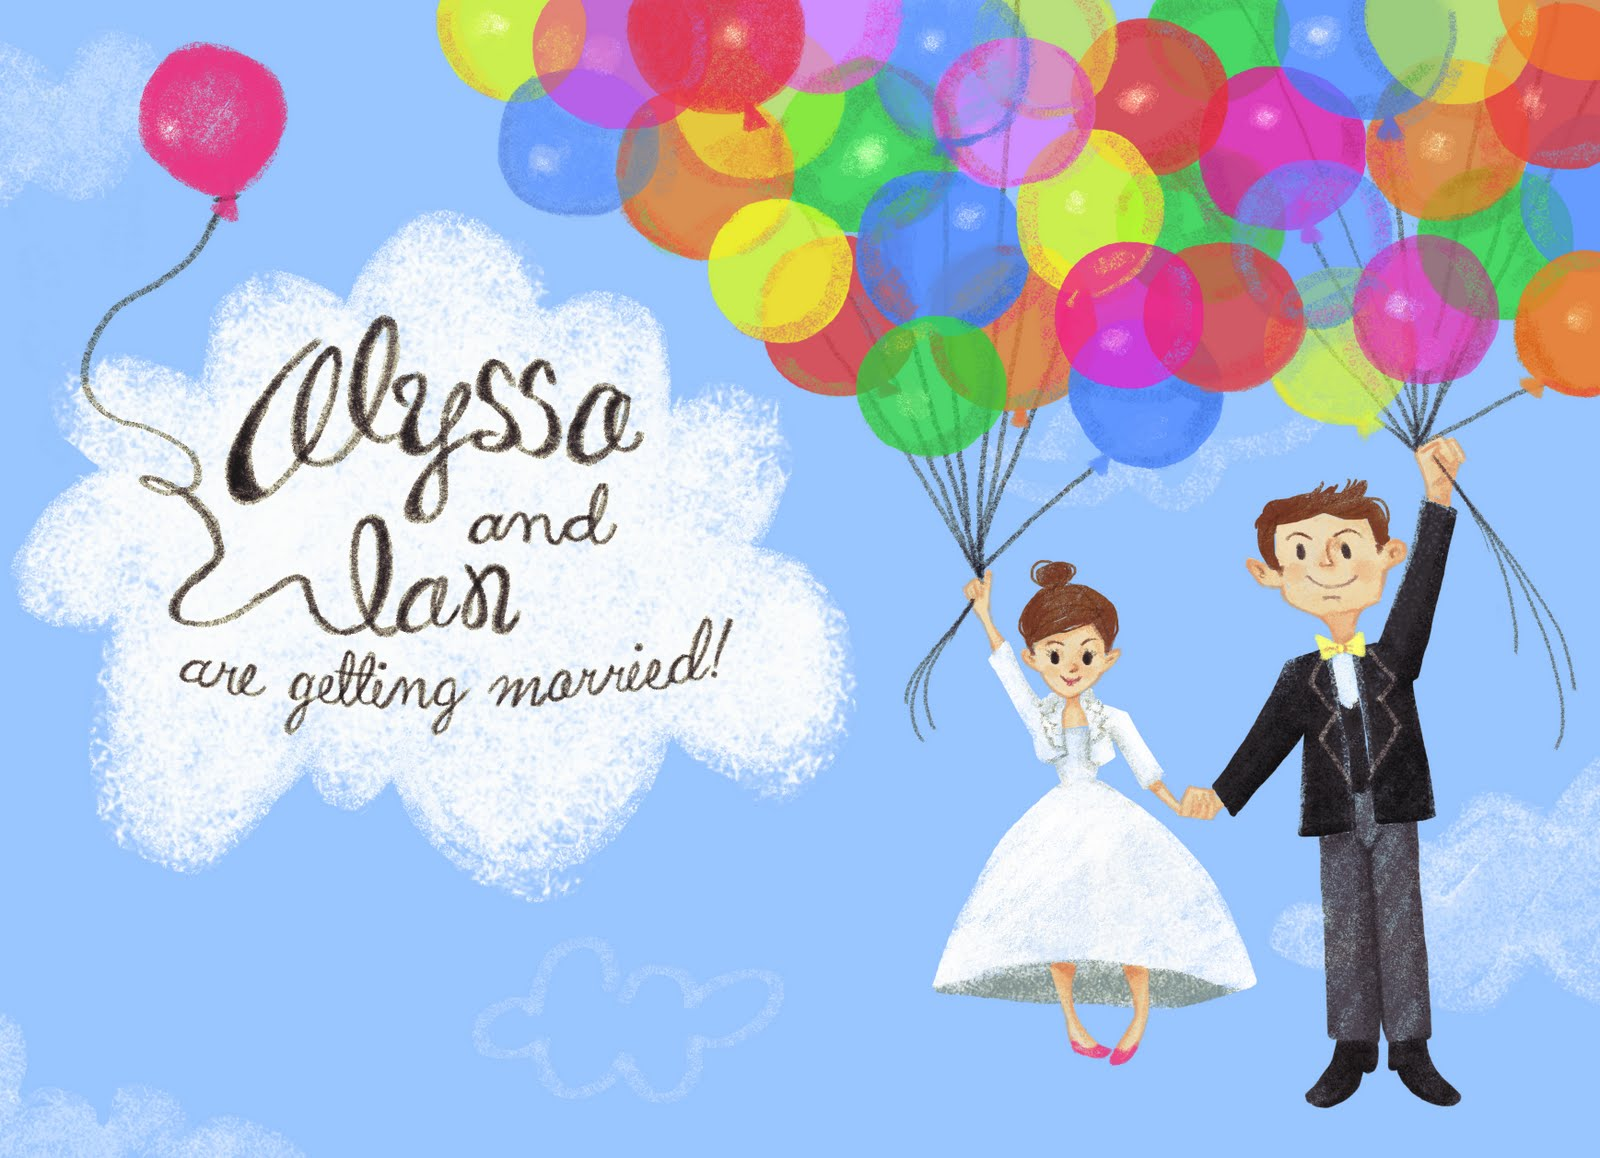 Up Themed Wedding Invitations: Alyssa Coles Illustrator: Up Themed Wedding Invite